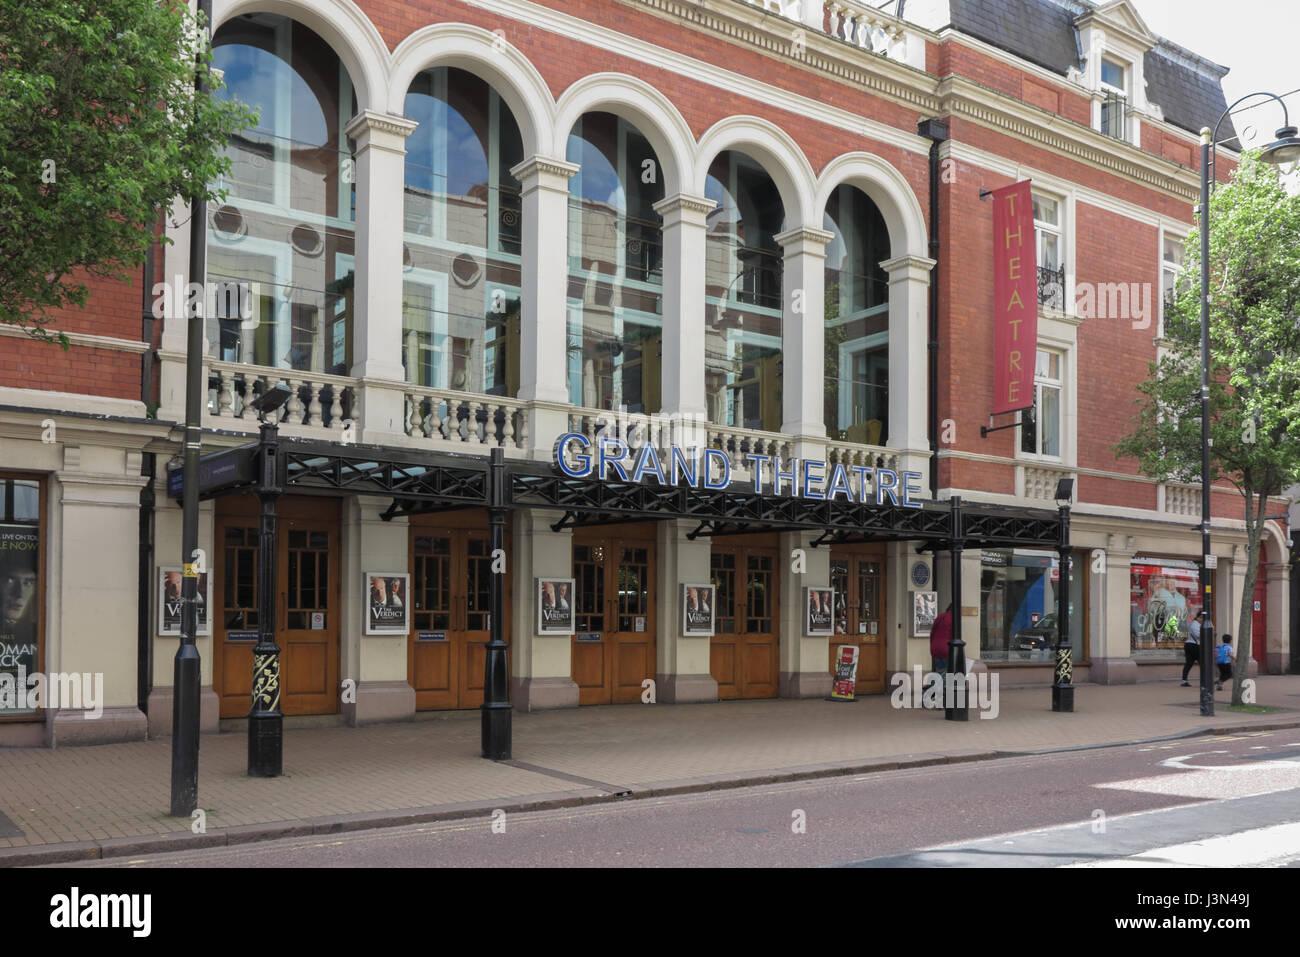 Grand Theatre, Lichfield Street, Wolverhampton - Stock Image